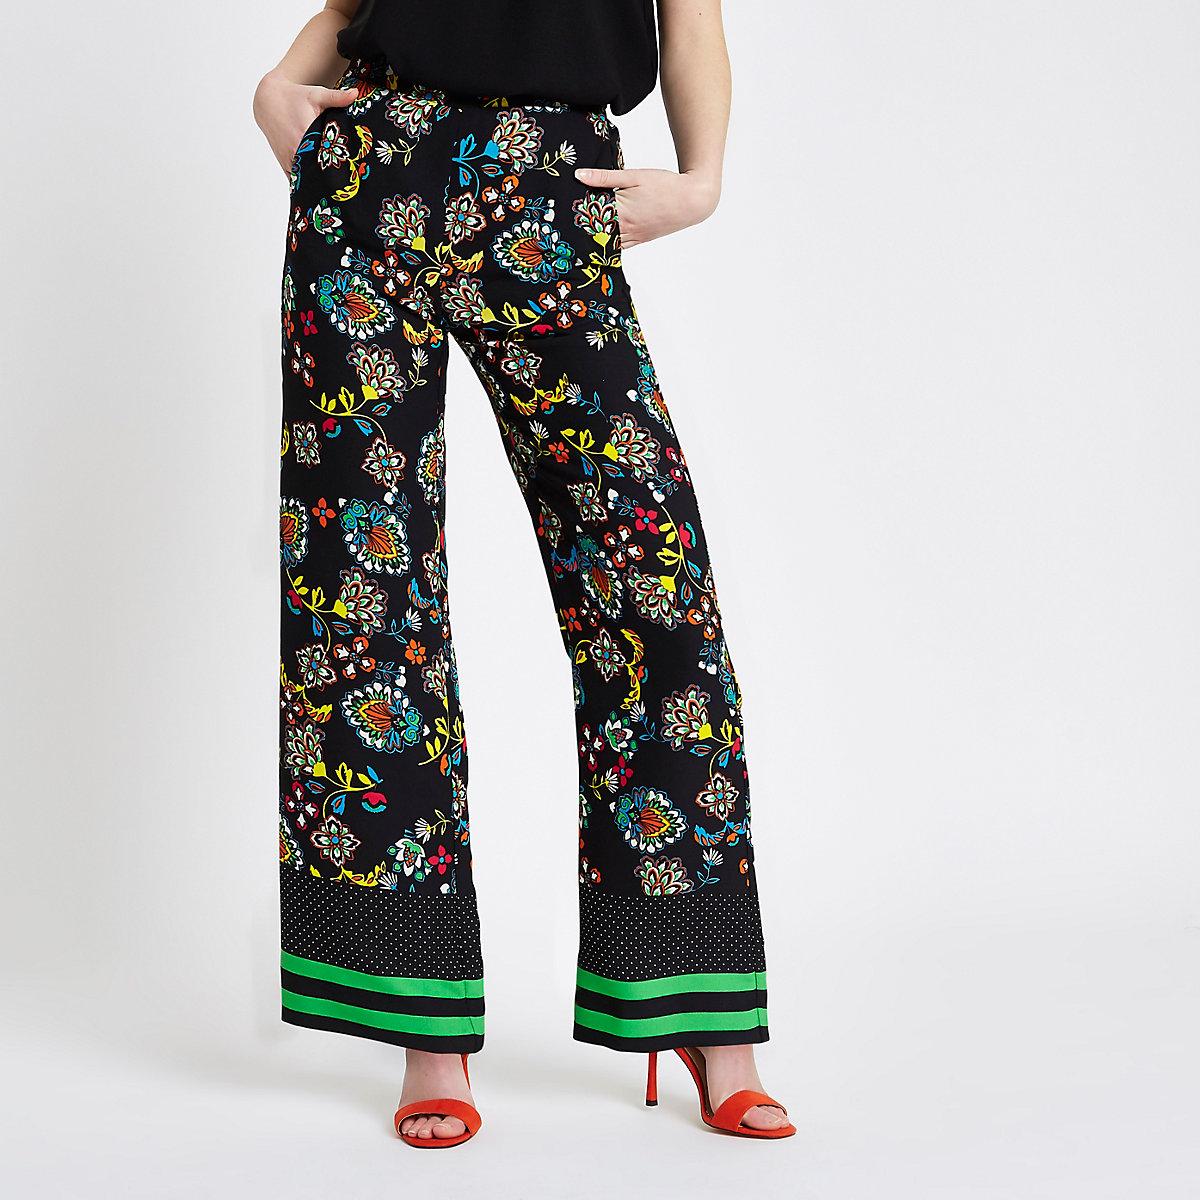 Black floral print wide leg pants